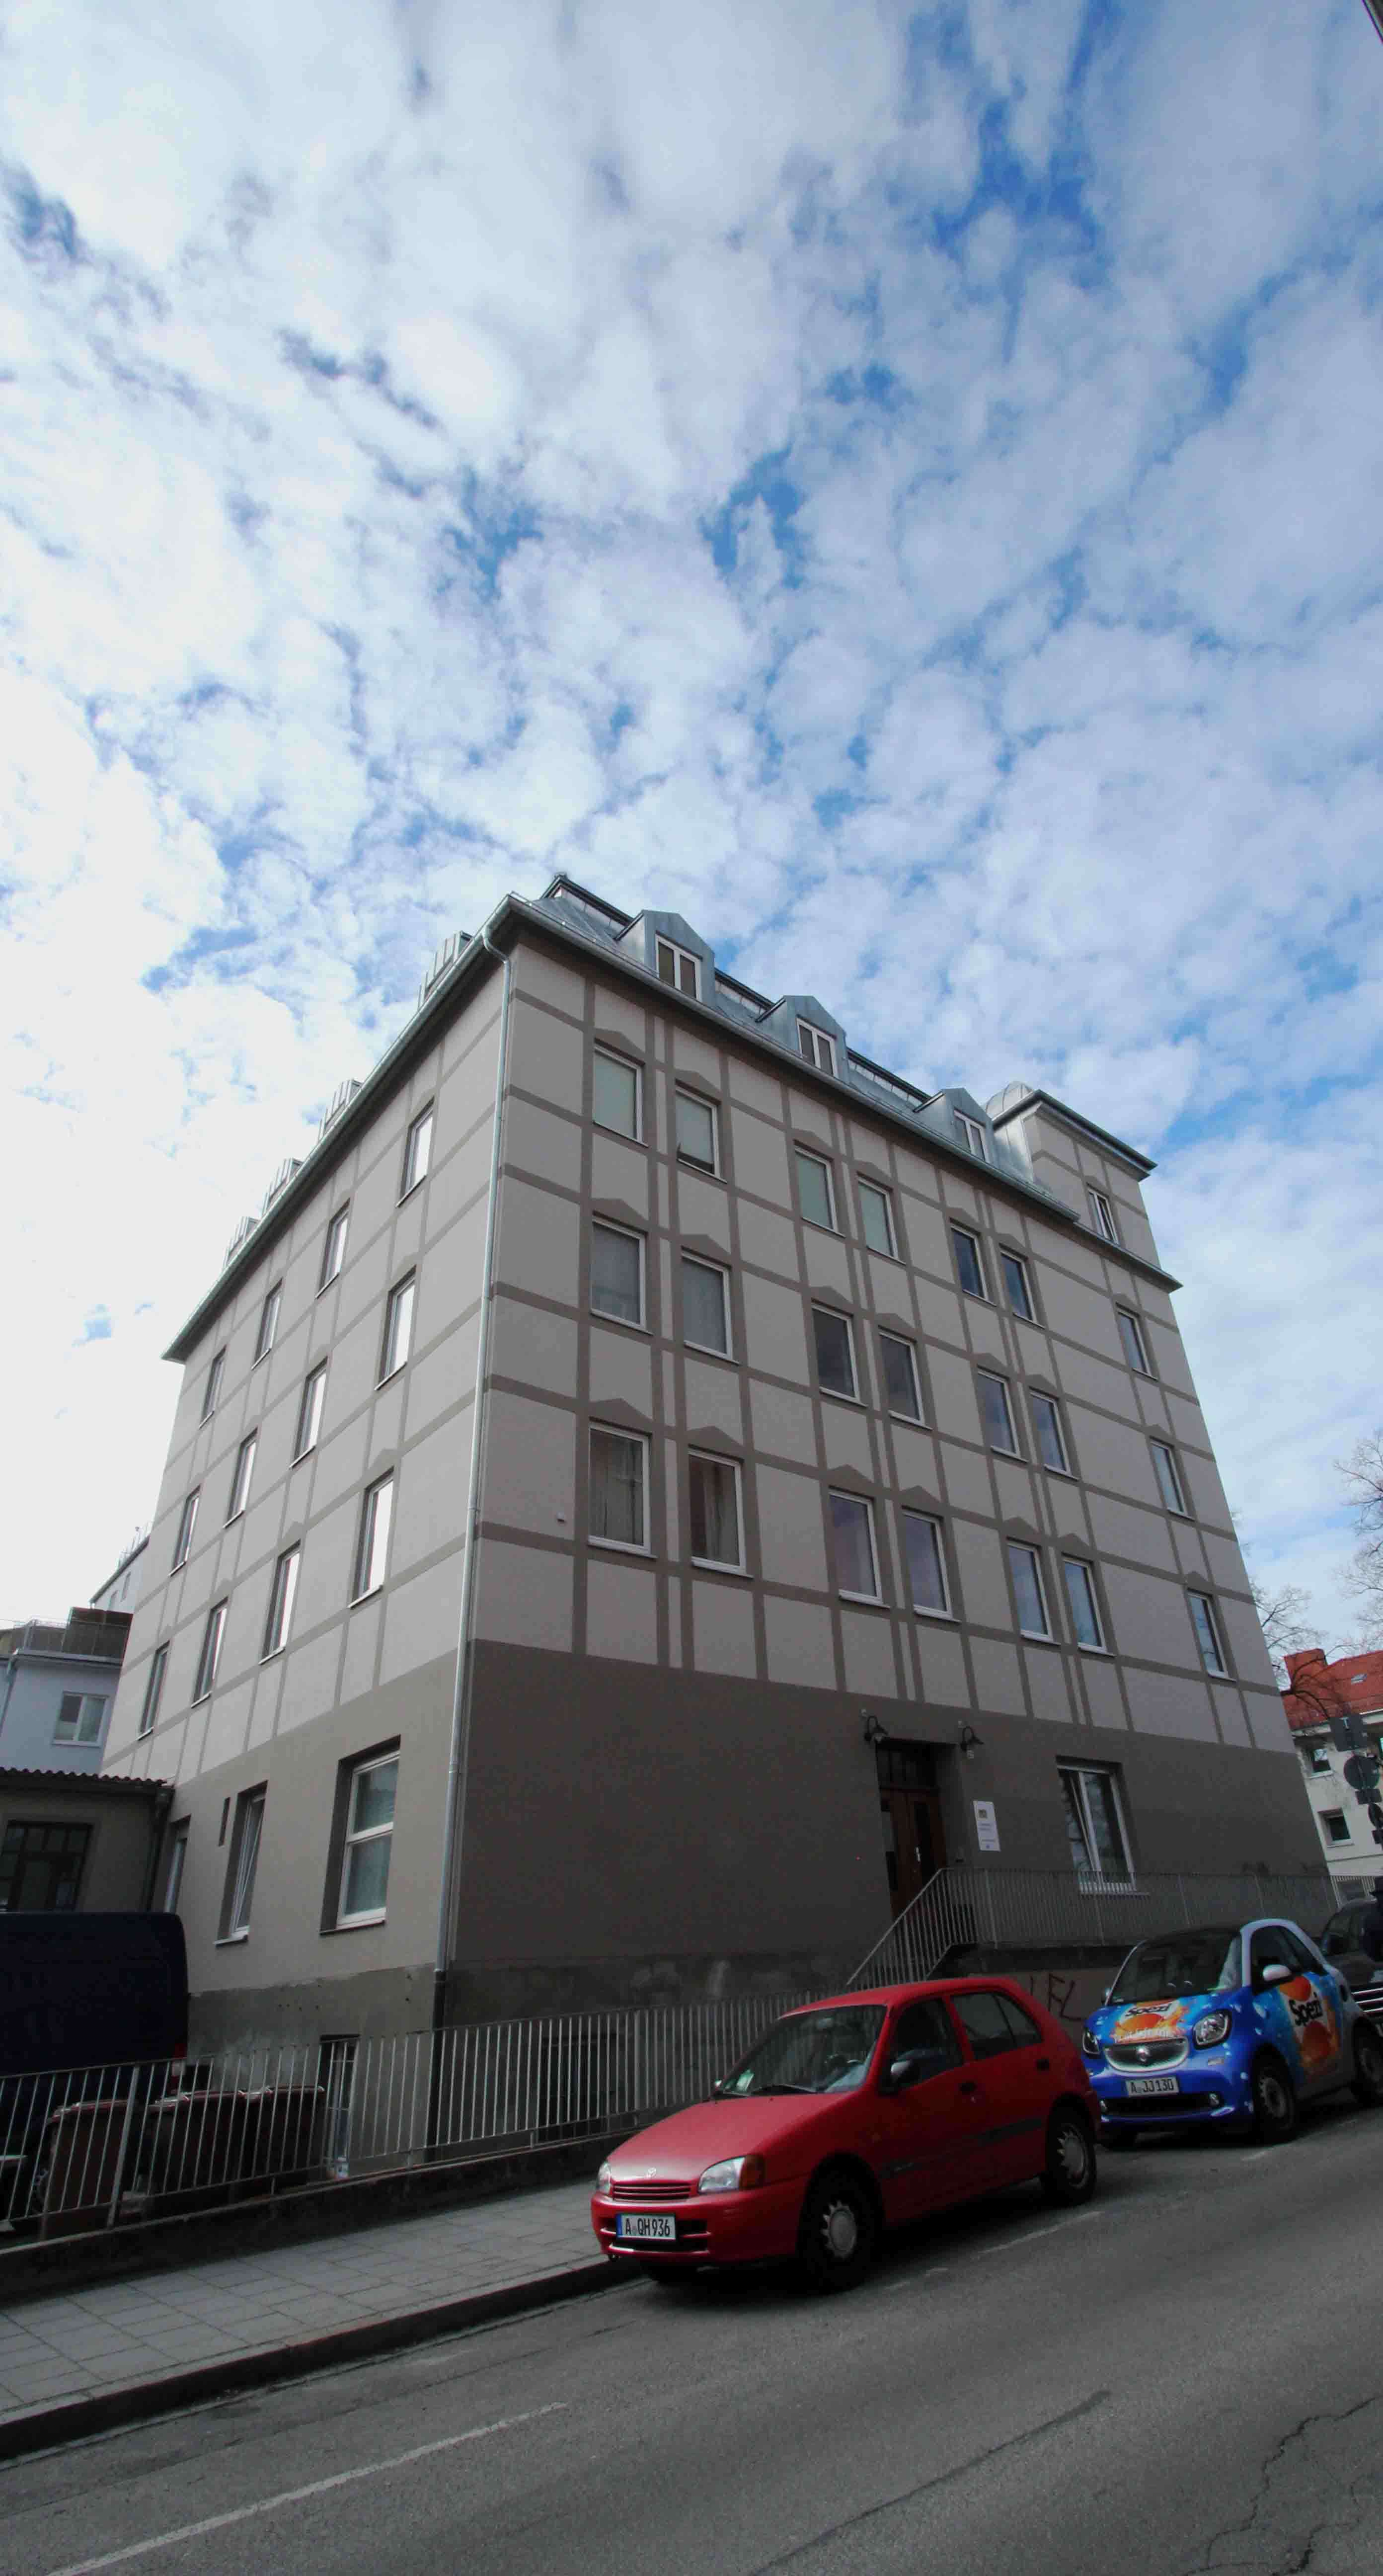 Ab 01.11.19 oder später - Top Lage - großzügige Altbauwhg. - Lift - Balkon -  Nähe Hbf. in Augsburg-Innenstadt